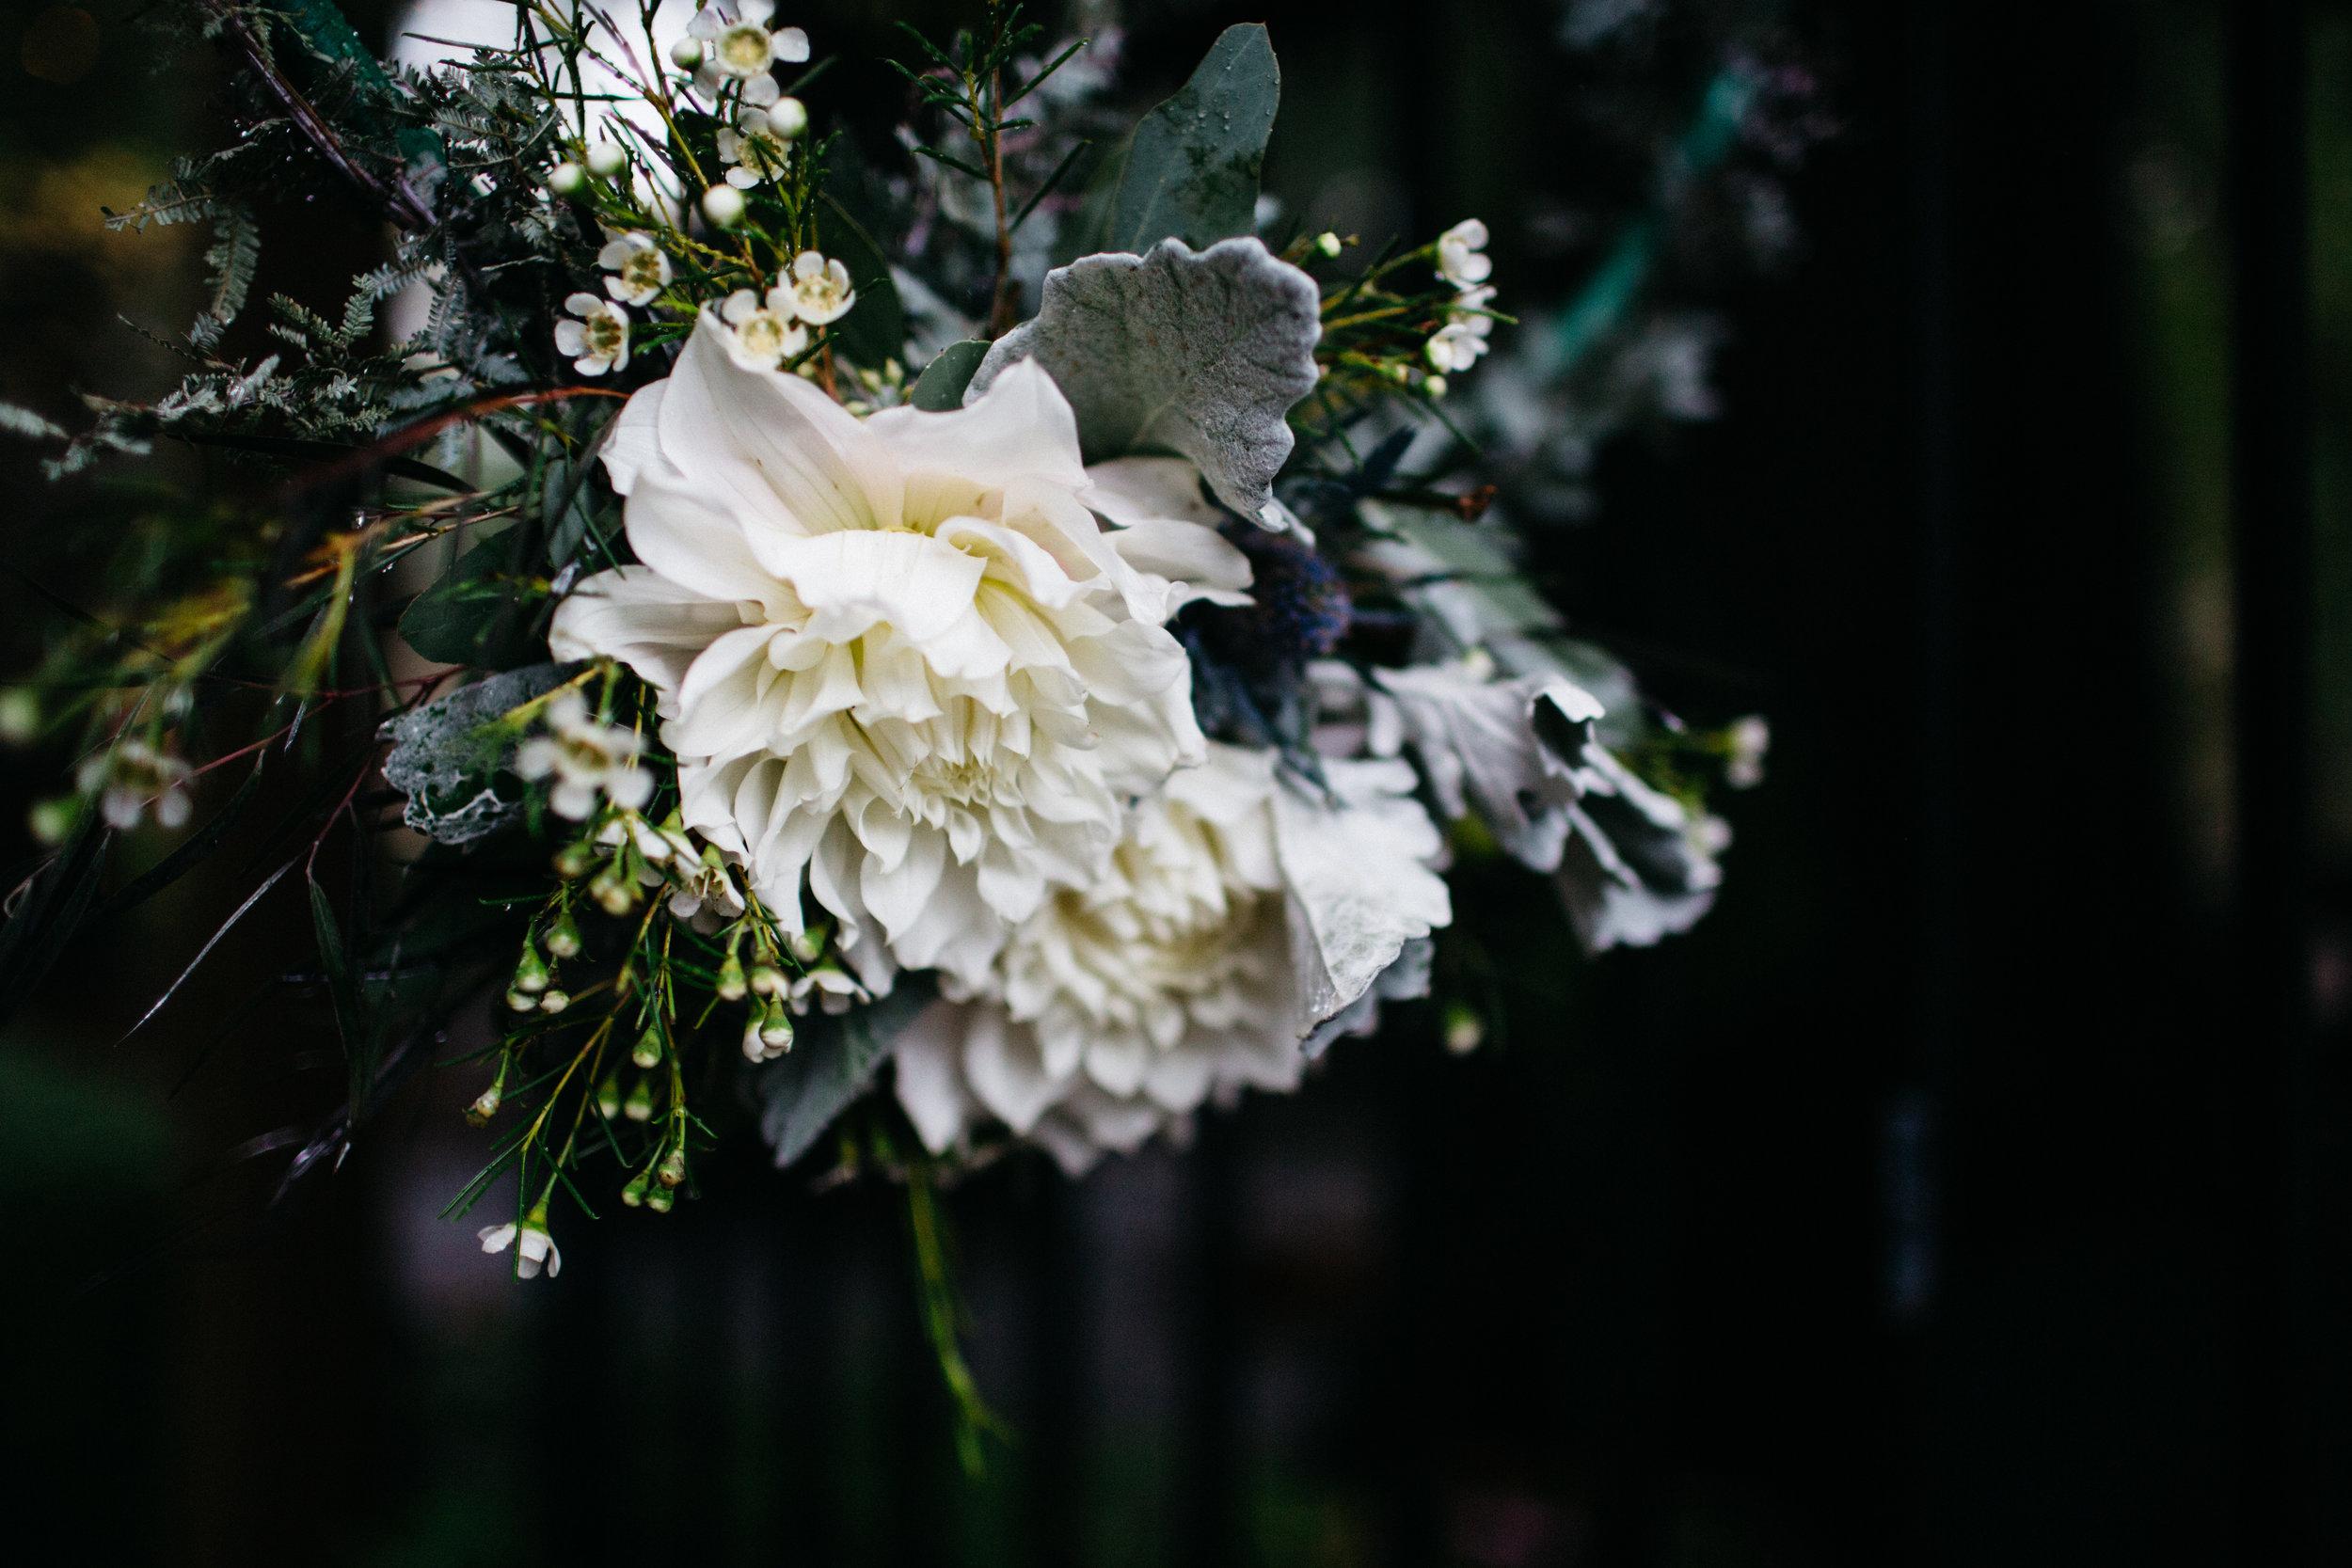 sweet_and_crafty_jocelyn_domingo_wedding_portfolio_050.jpg